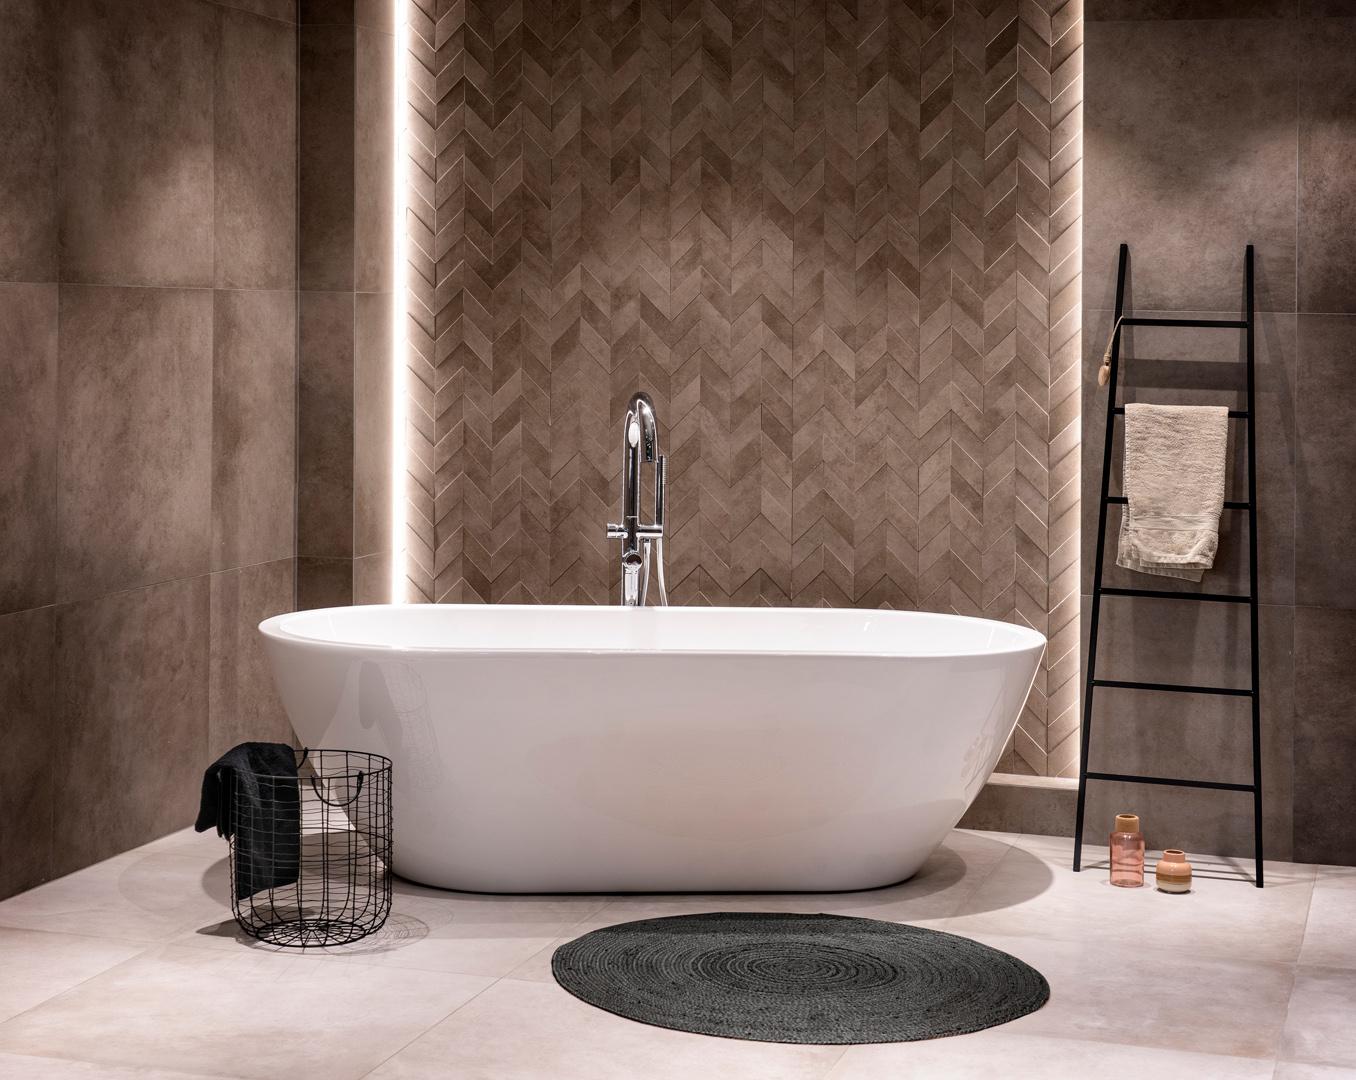 Mijn-bad-in-stijl-tip3-licht-badkamer